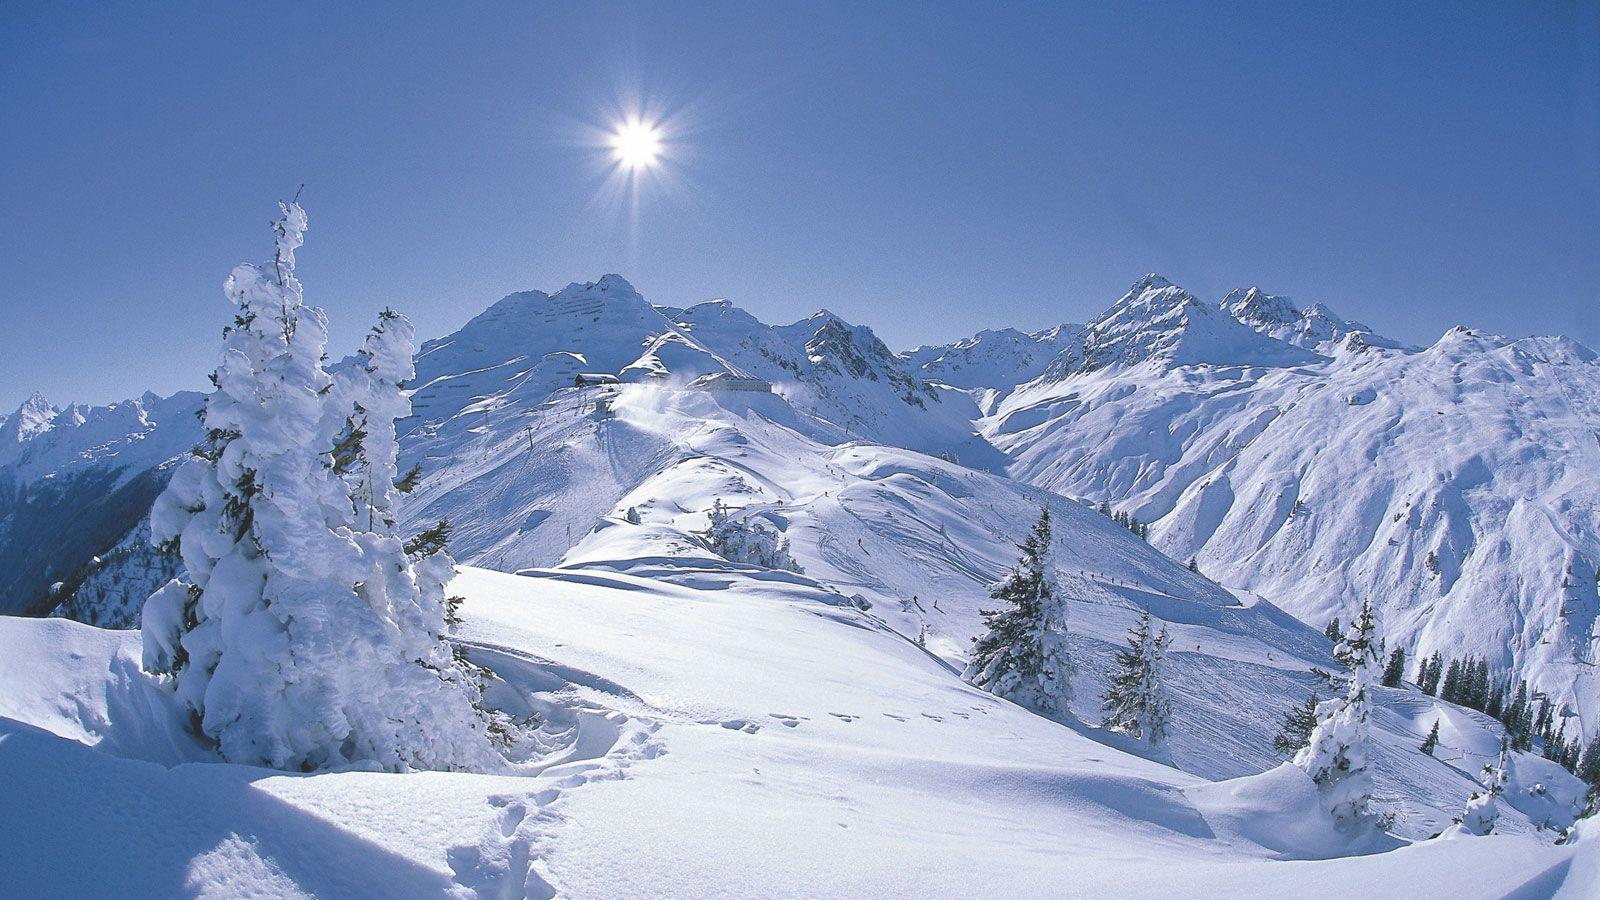 skiing wallpaper download